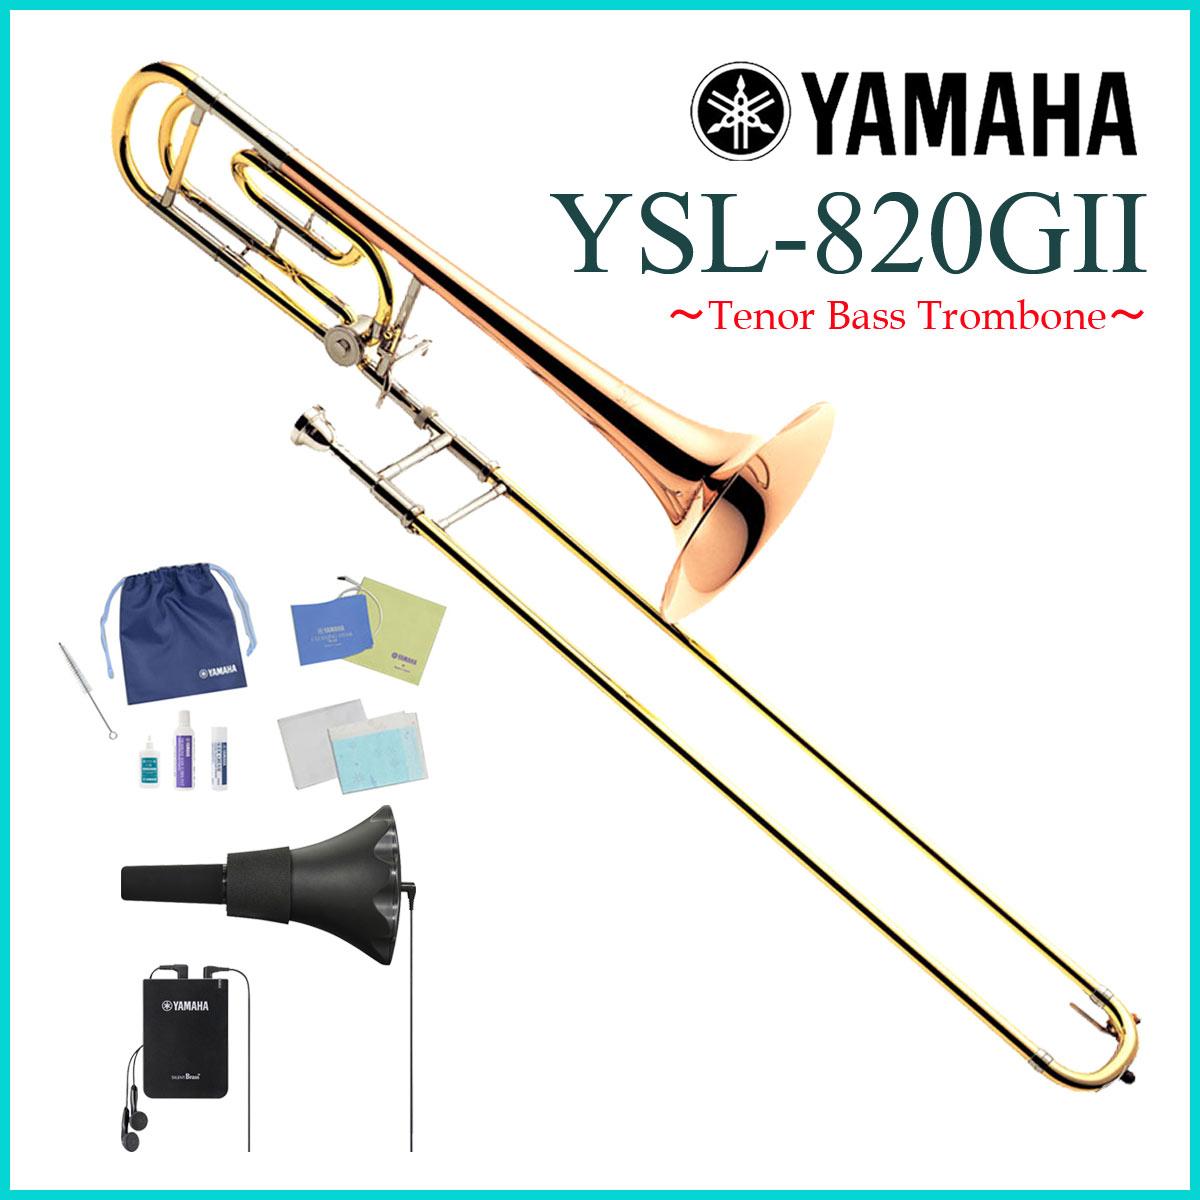 YAMAHA / YSL-820G2 ヤマハ トロンボーン Torombone YSL820G2 《サイレントブラスセット》《未展示倉庫保管品※出荷前調整》《5年保証》